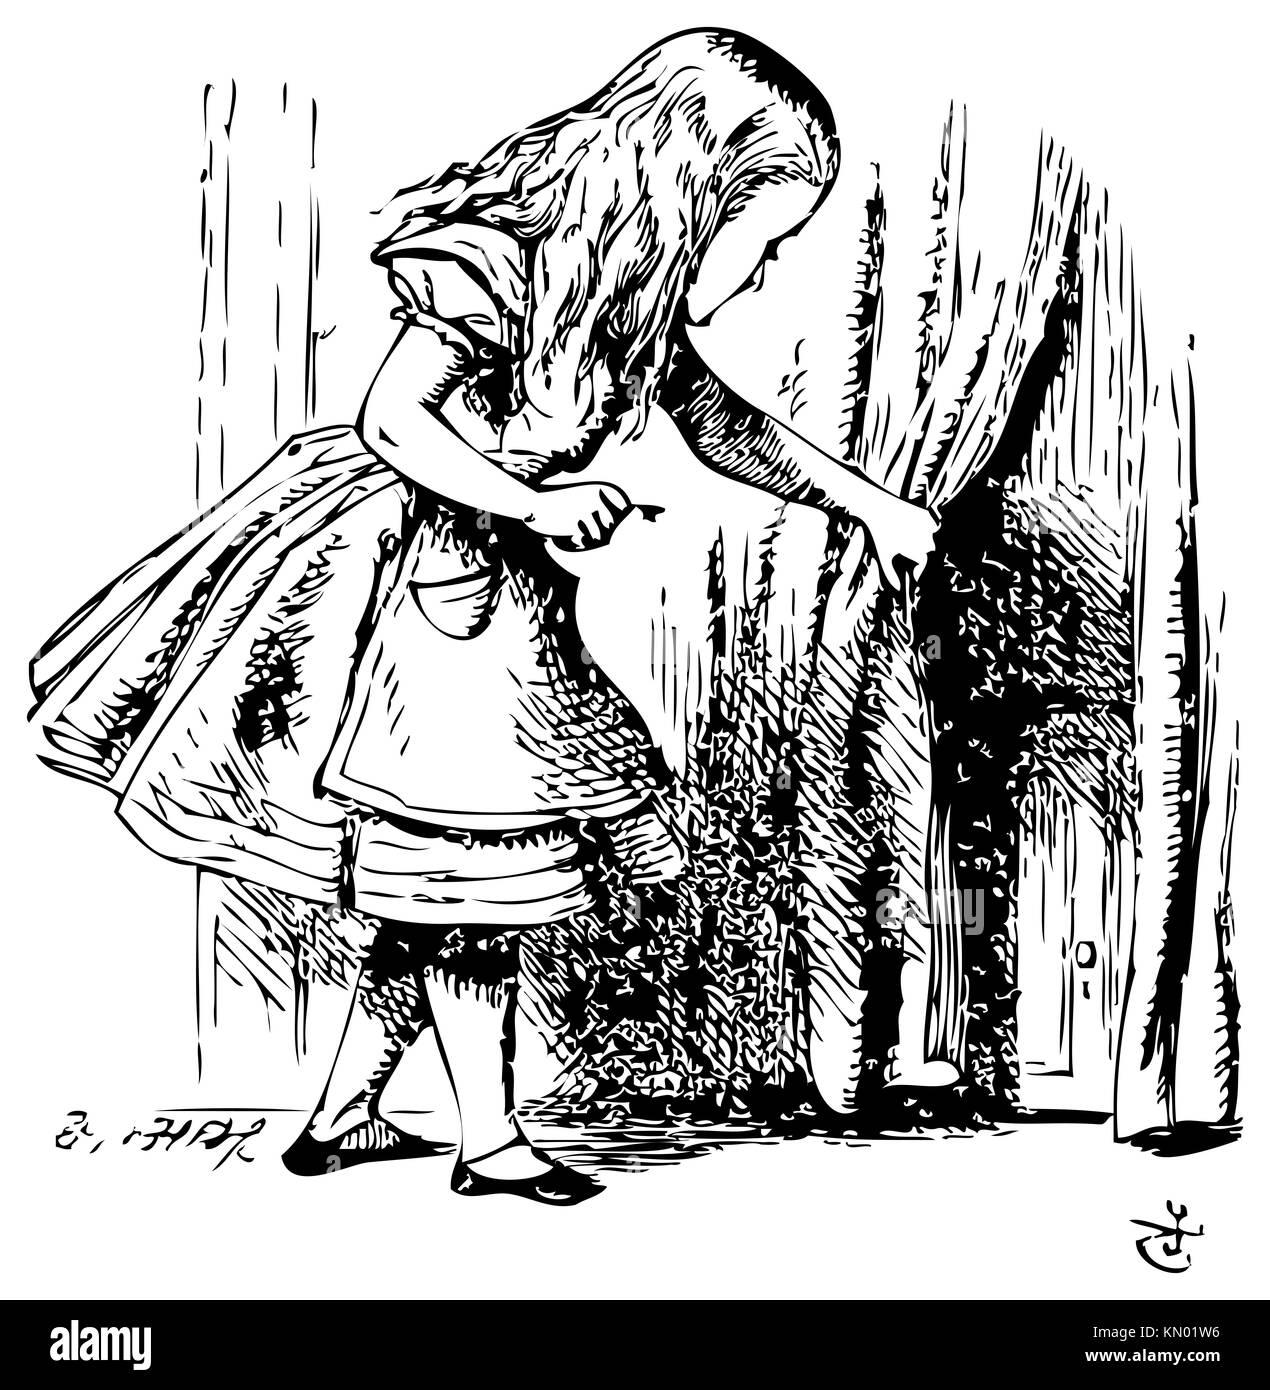 Alice in Wonderland Alice is looking behind a curtain to reveal a hidden door Alice´s Adventures in Wonderland Illustration from John Tenniel  sc 1 st  Alamy & Alice in Wonderland Alice is looking behind a curtain to reveal a ...